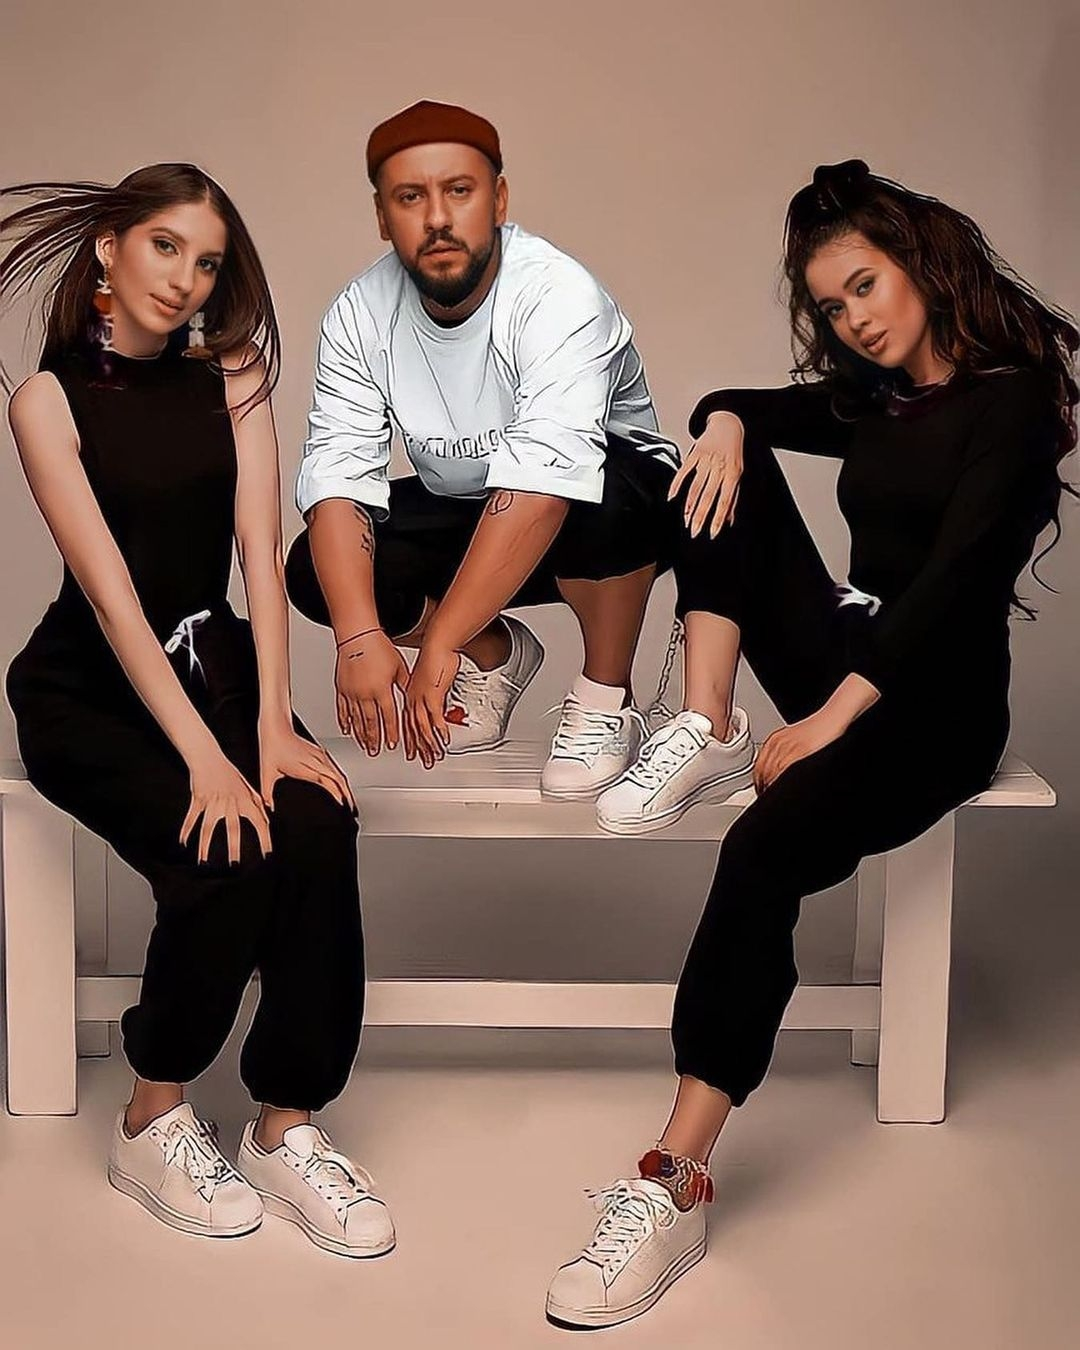 MONATIK прекратил сотрудничество с певицами Lida Lee и Nino Basilaya - фото №1